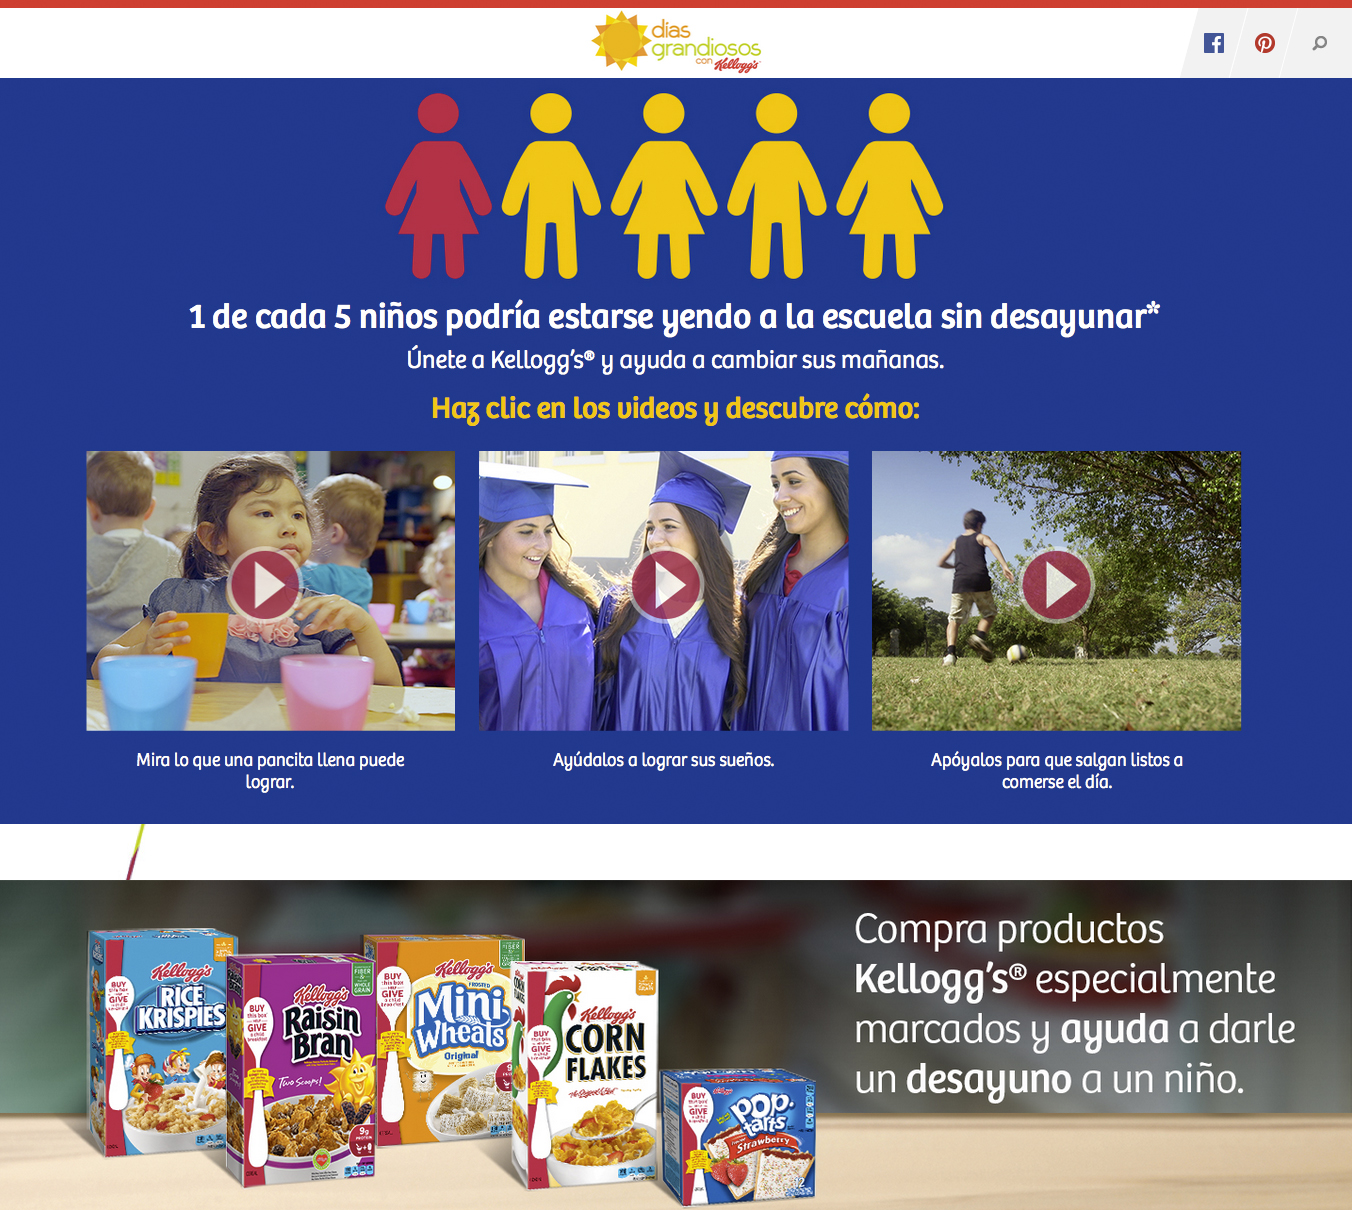 DG web site.jpg